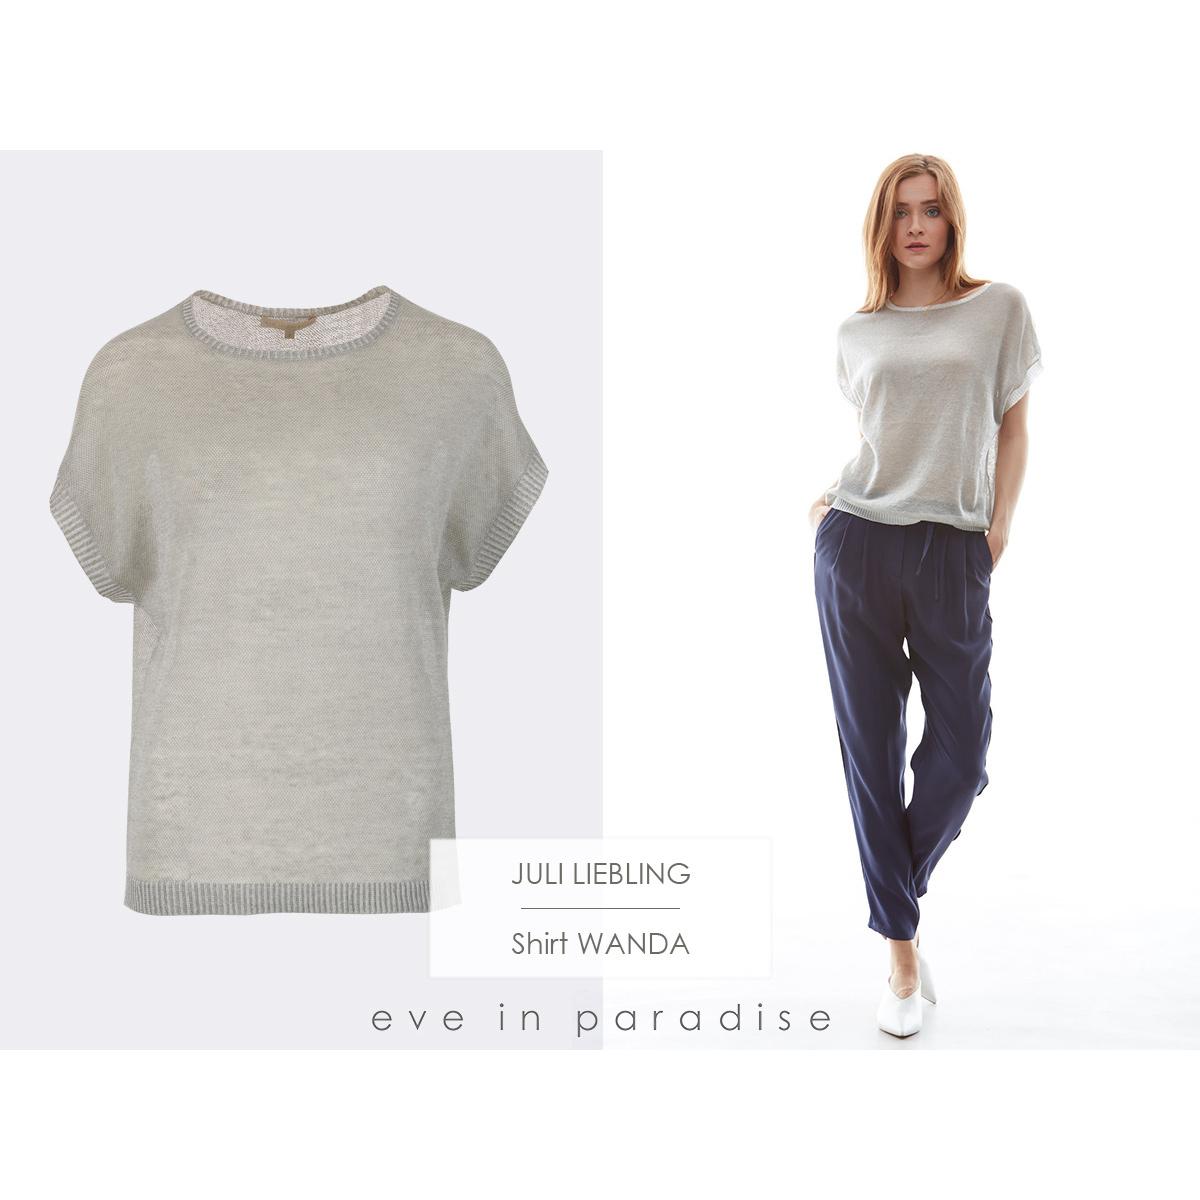 Juli liebling netzoptik shirt wanda f r frauen eve in paradise online shop damenmode und - Liebling englisch ...